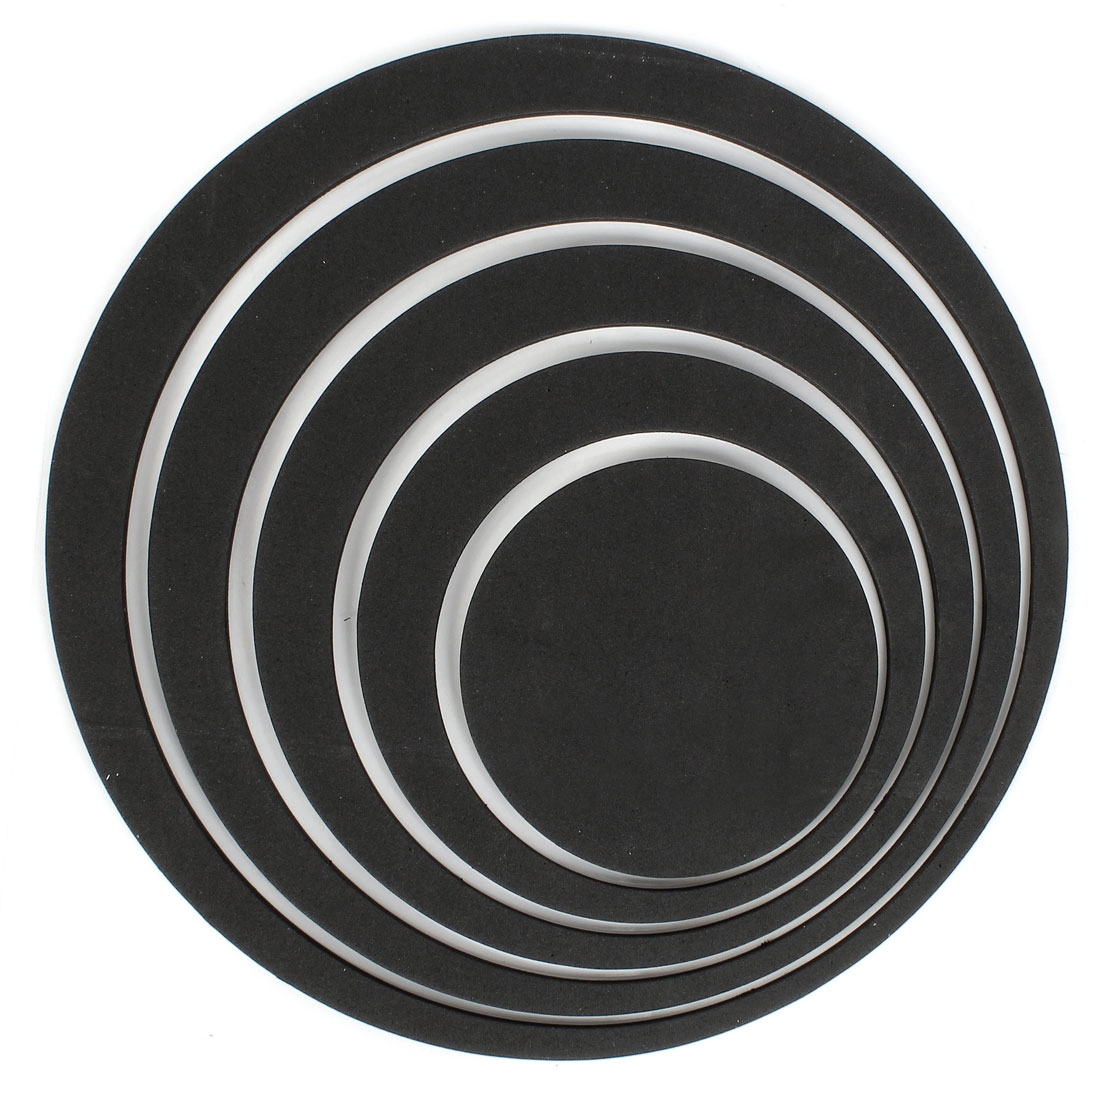 Home Bathroom Decor 3D Circle Shape Foam Wall Sticker Decal DIY Black